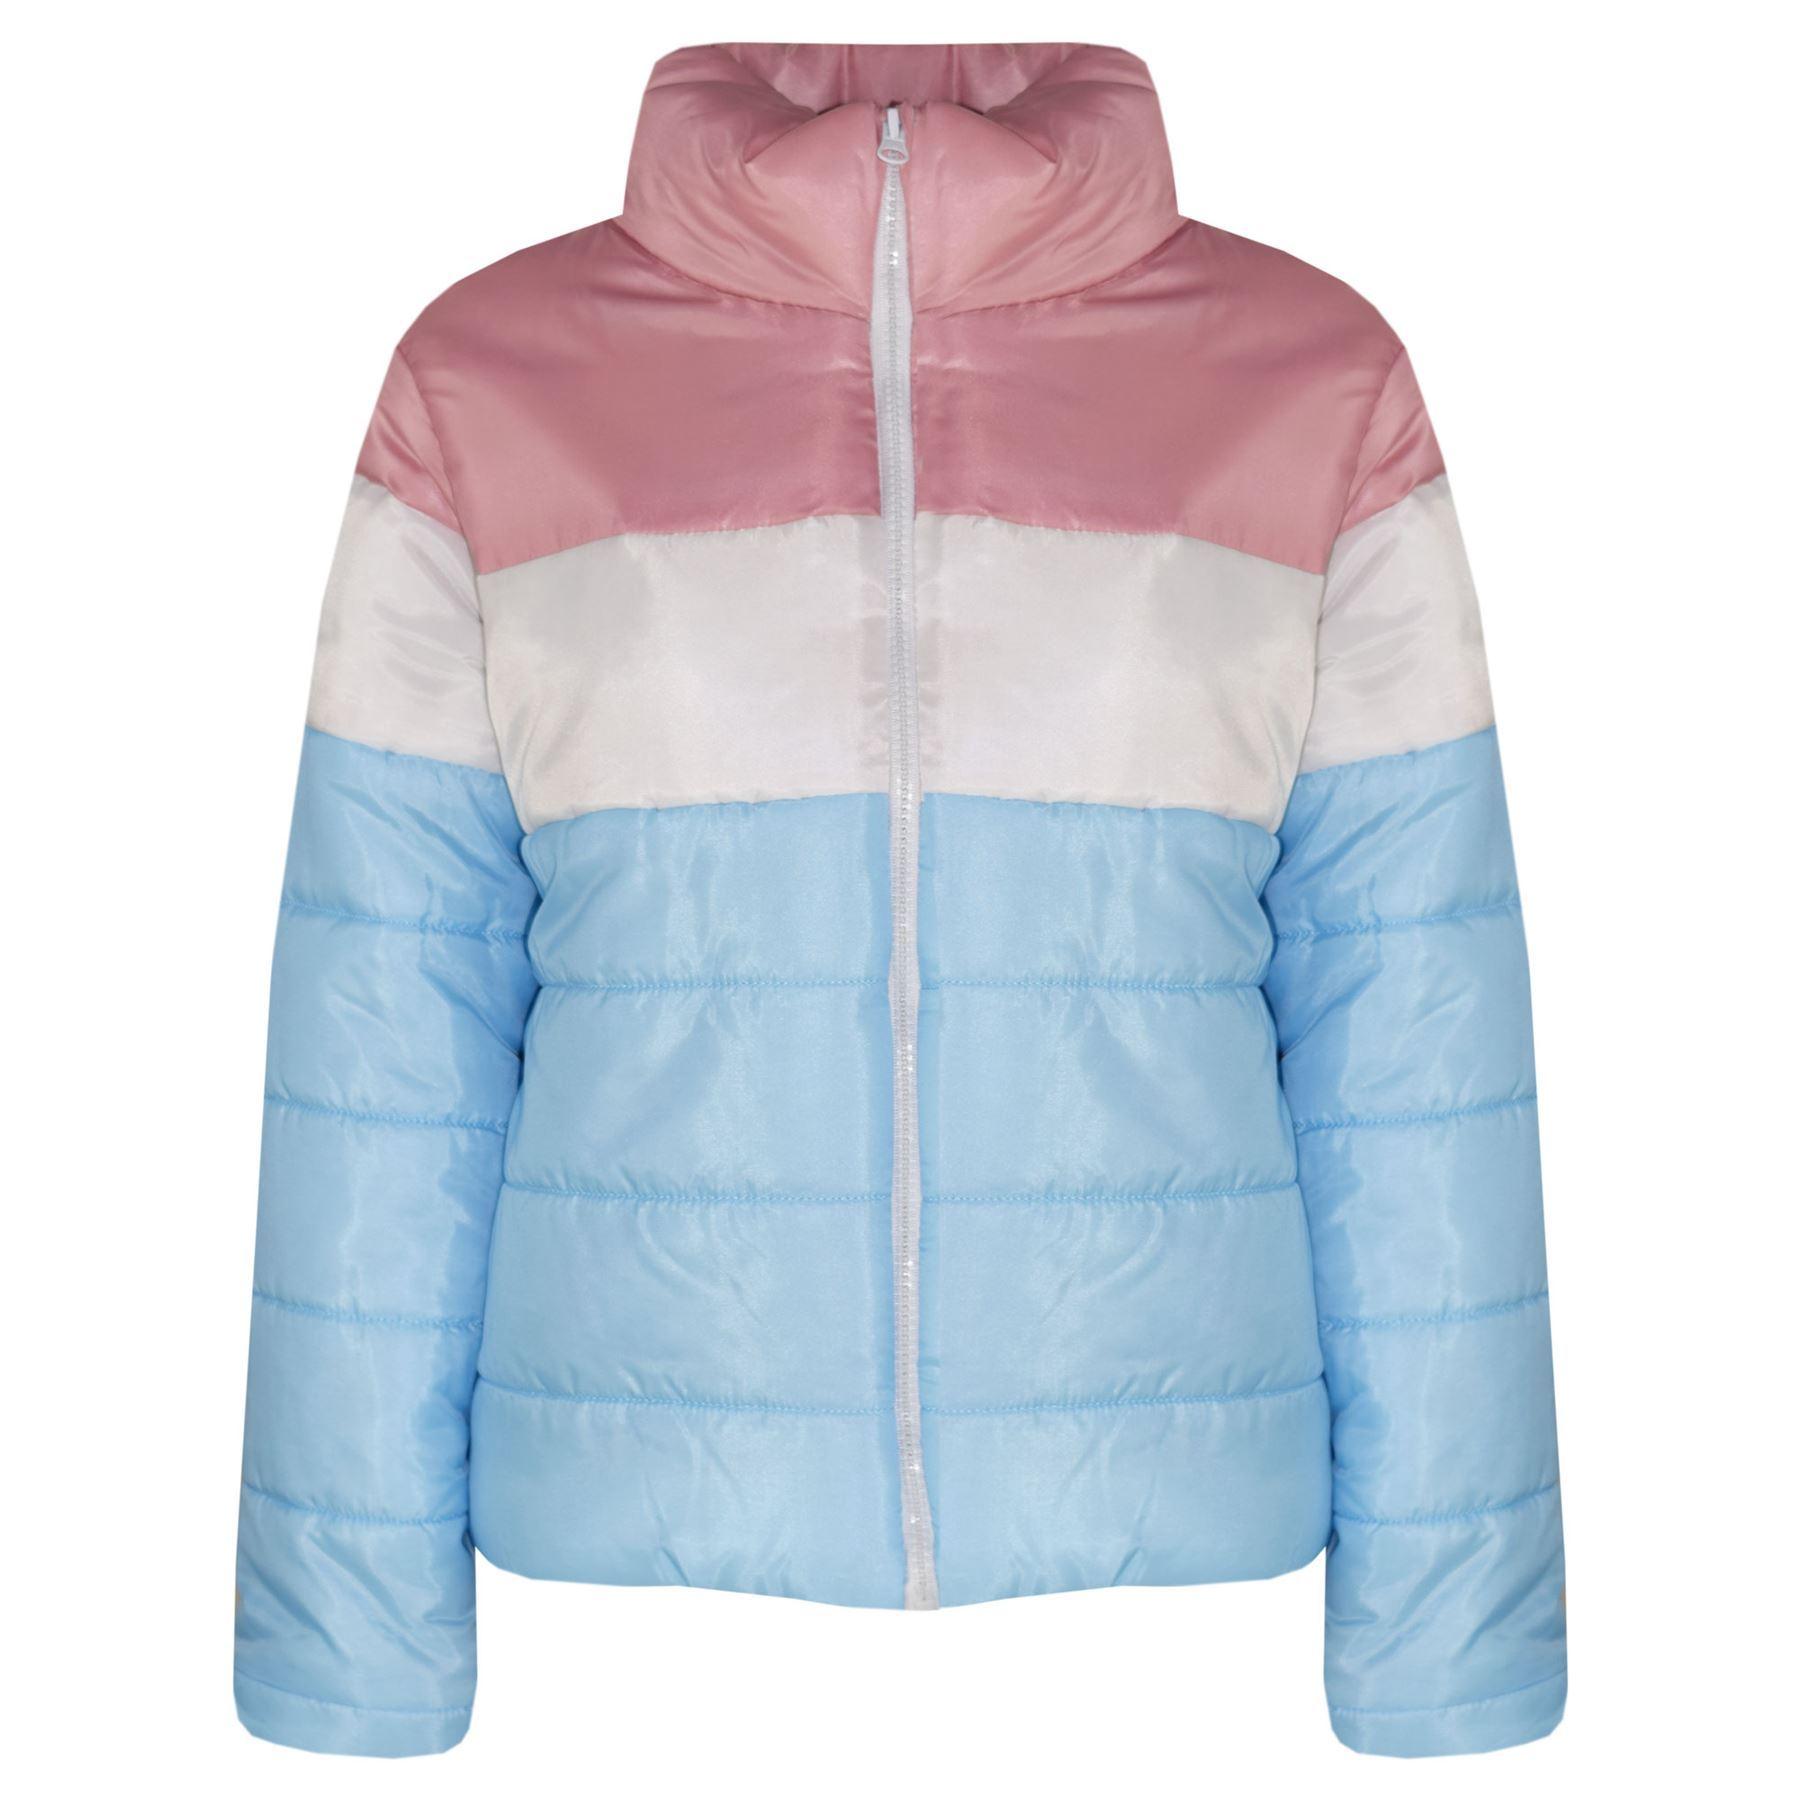 f6ee19a9 Kids Boys Girls Jackets Designer Contrast Panel Hooded Padded ...